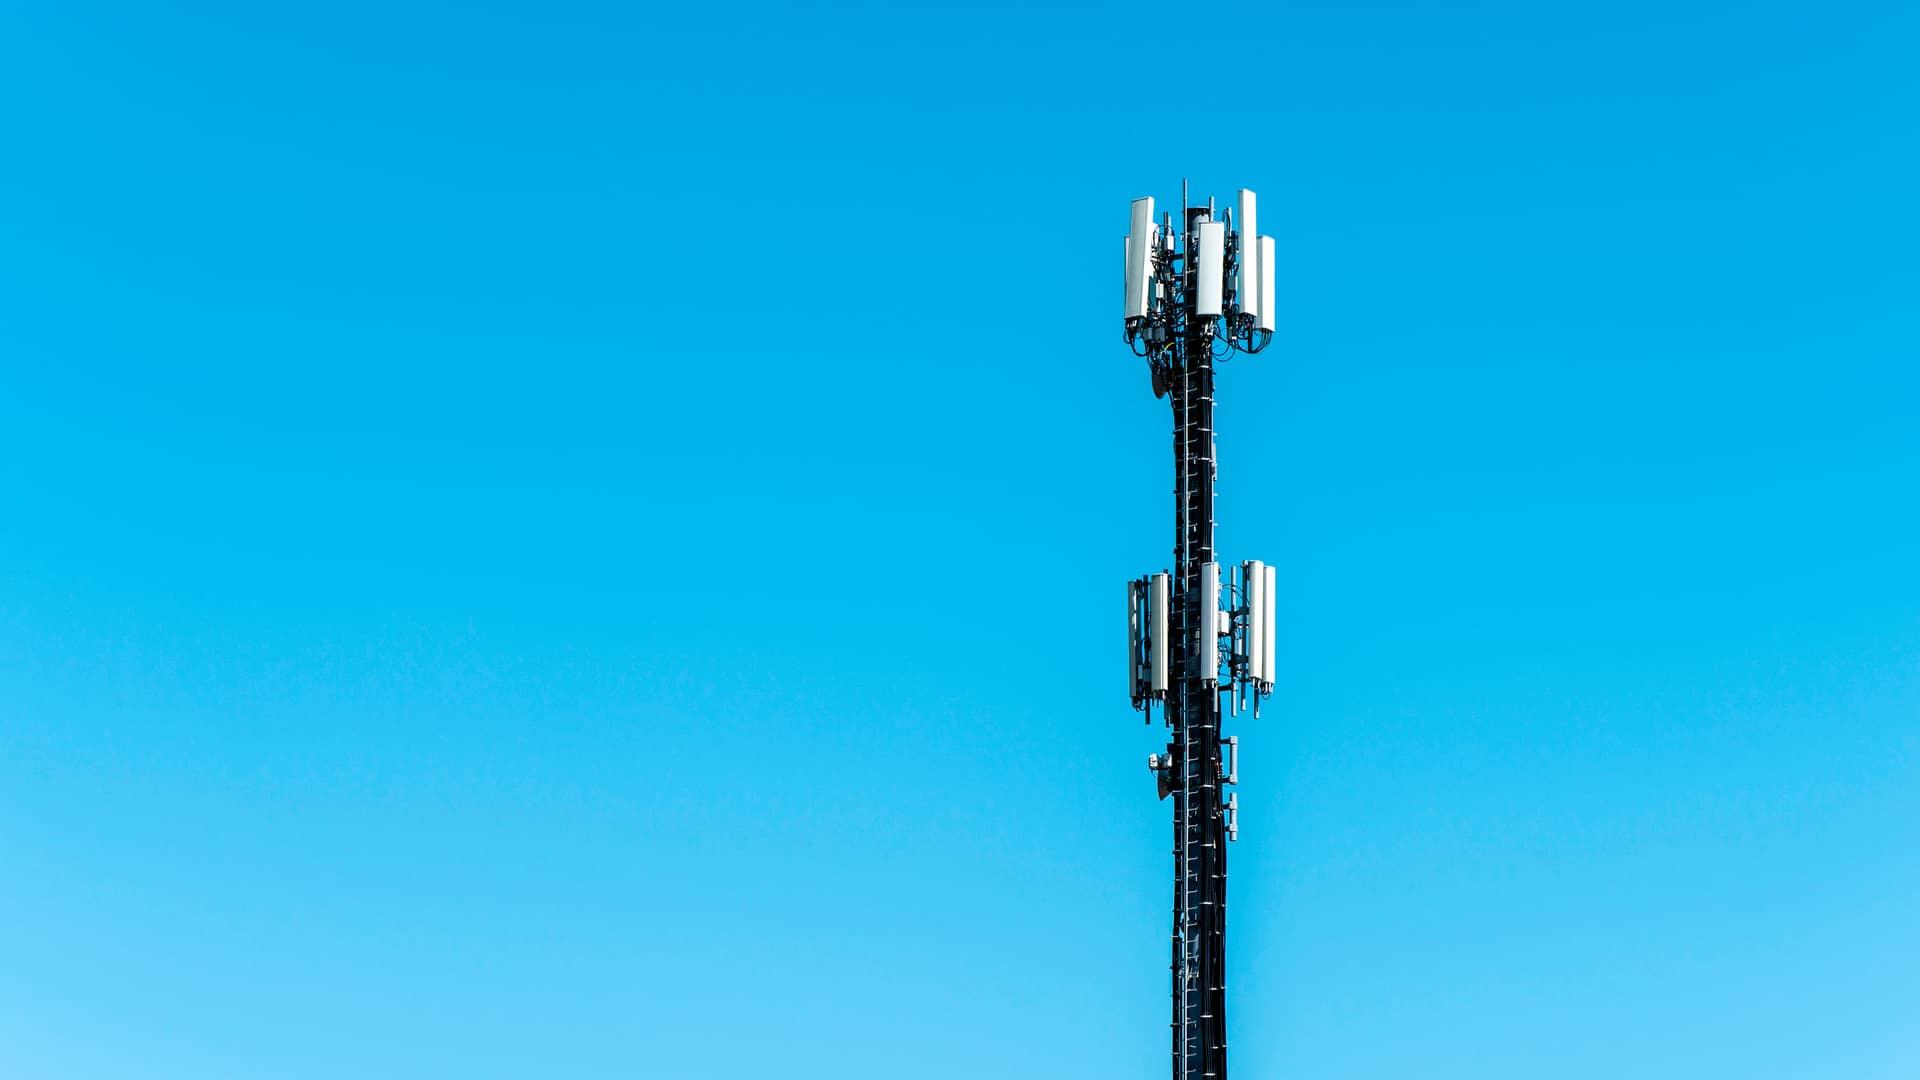 Antena telefónica simboliza coberturatue 5g tuenti